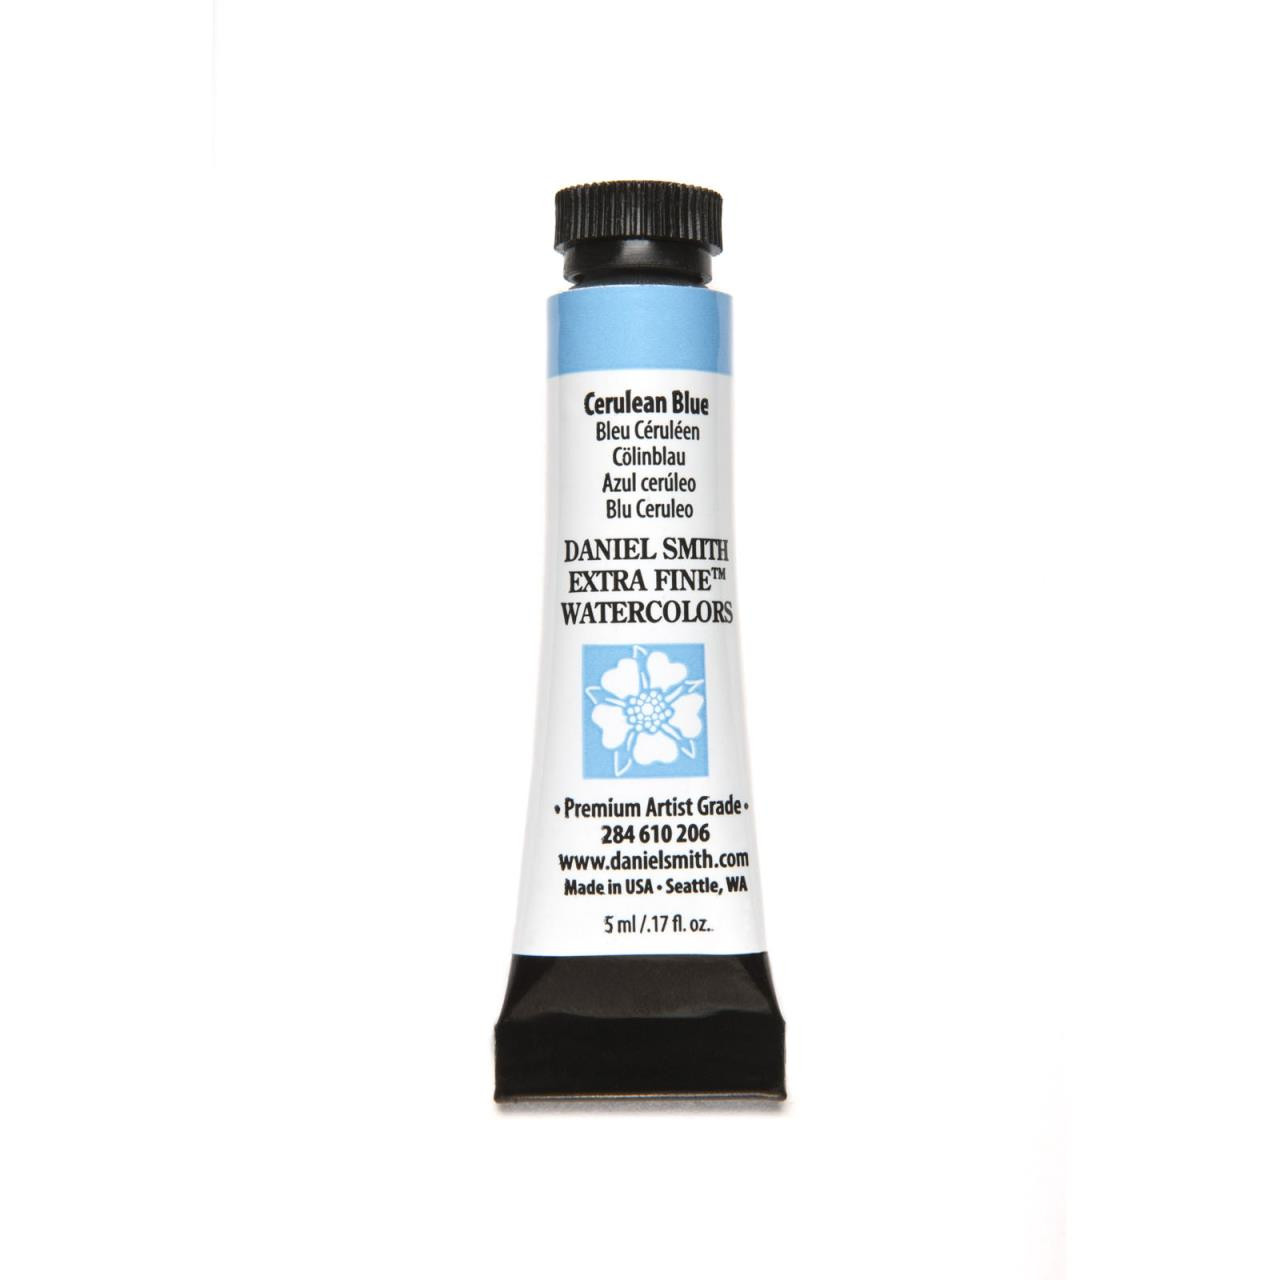 Cerulean Blue, DANIEL SMITH Extra Fine Watercolors 5ml Tubes -